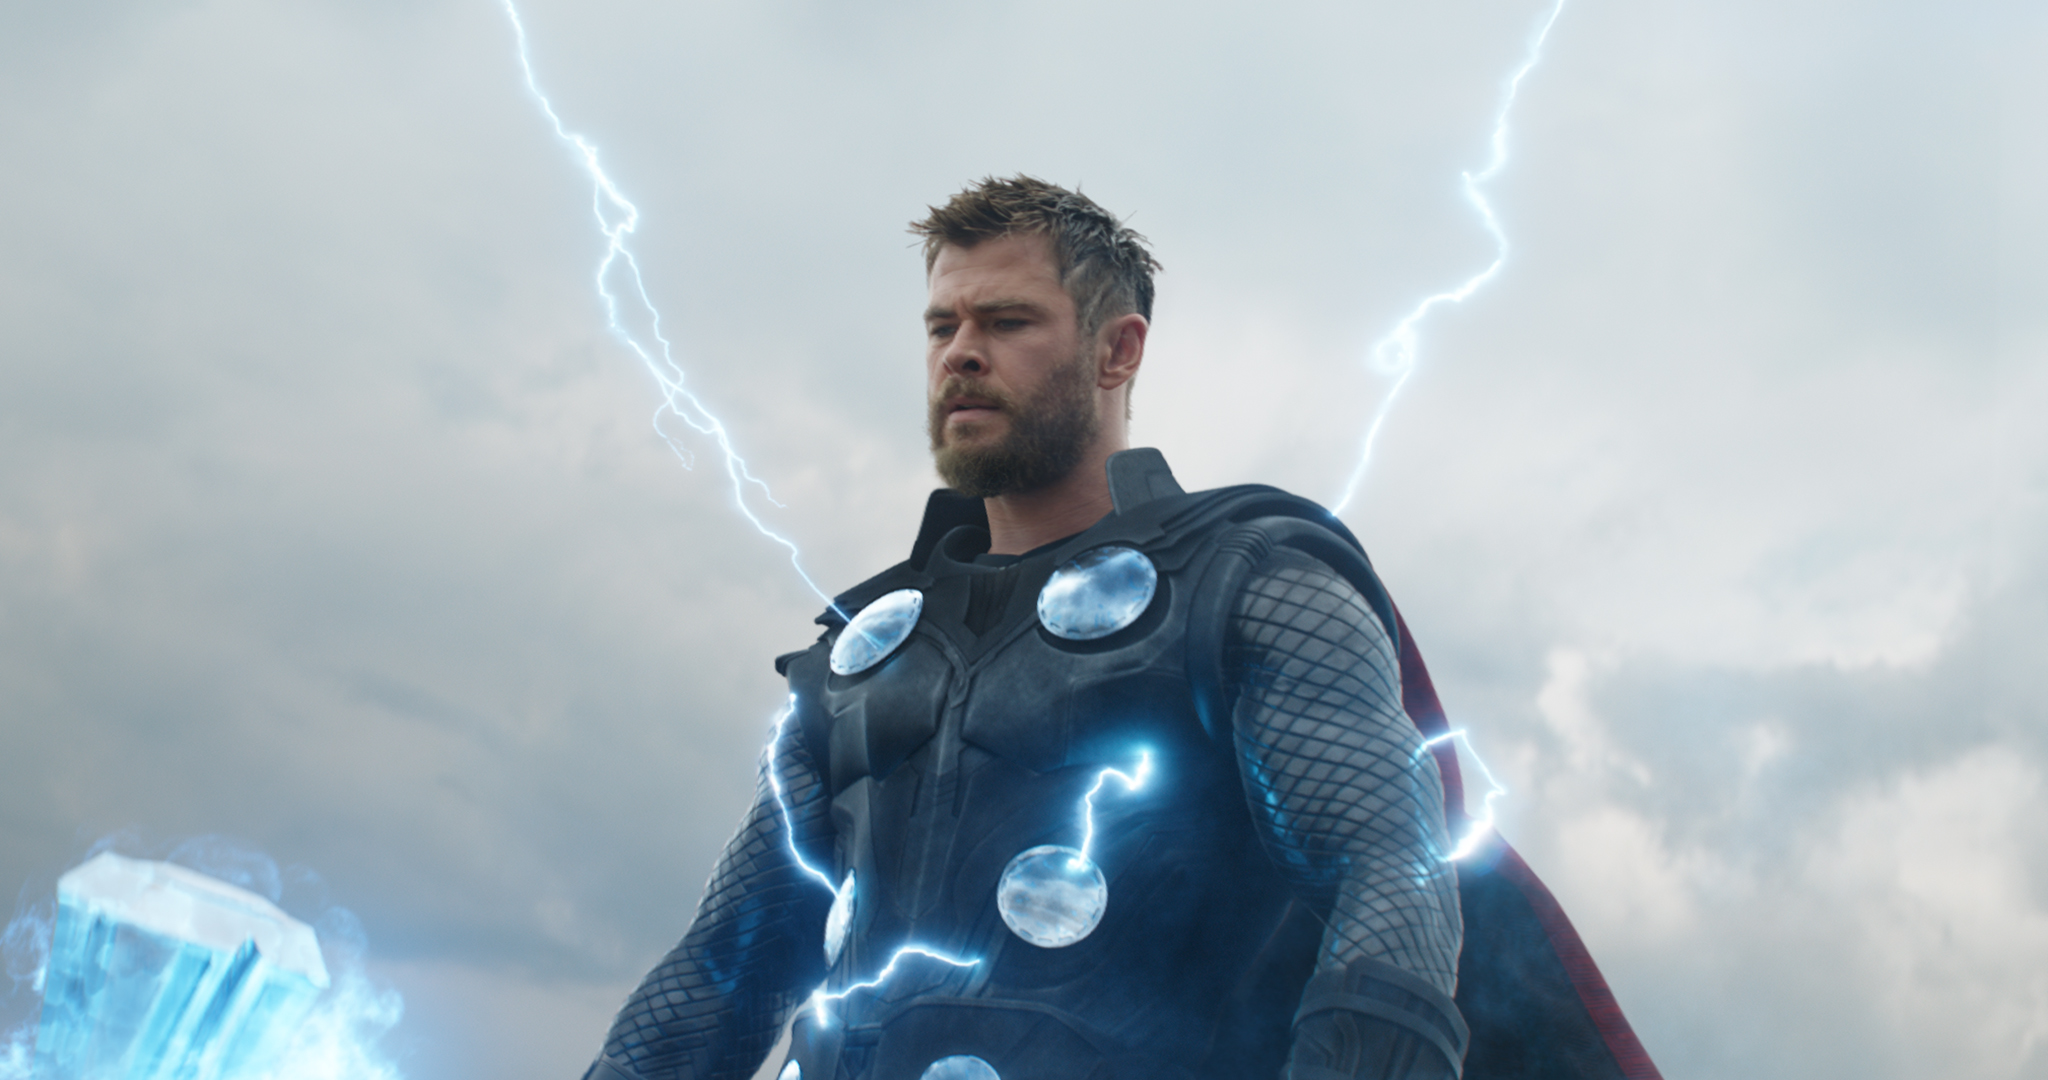 Still from 'Avengers: Endgame' featuring Thor (Chris Hemsworth).